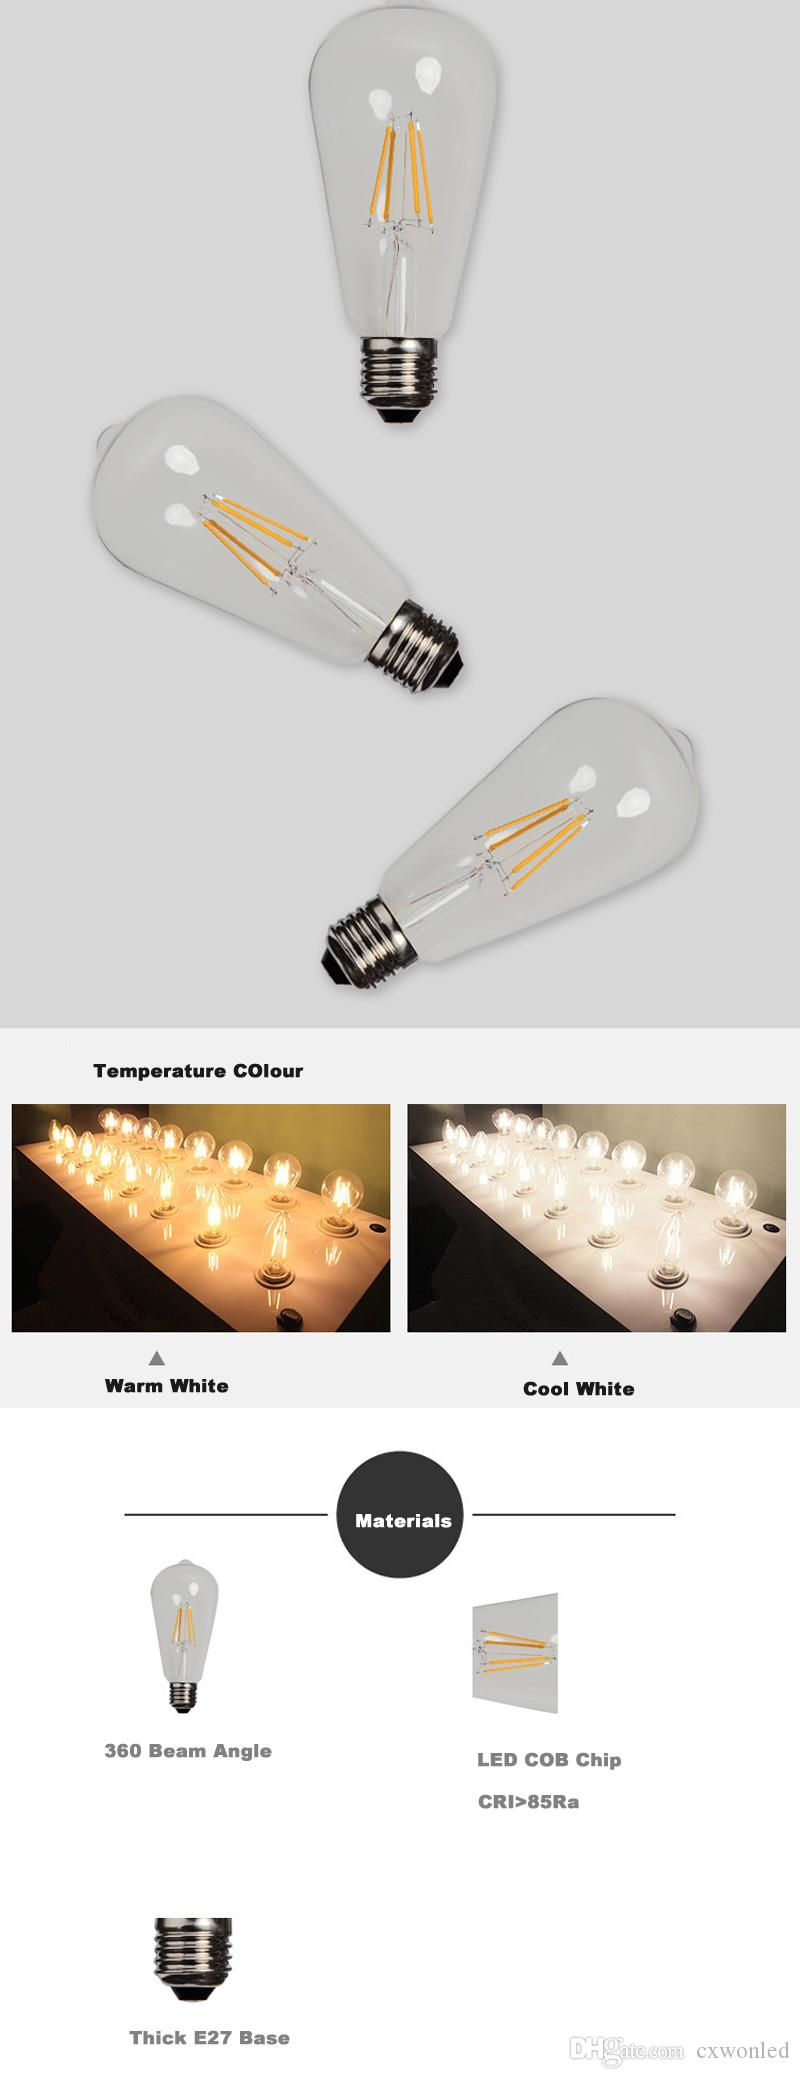 Супер яркий диммируемый E27 ST64 Эдисон Стиль Винтаж Ретро COB LED Лампа накаливания Лампа Теплый Белый 85-265 В ретро LED лампа накаливания